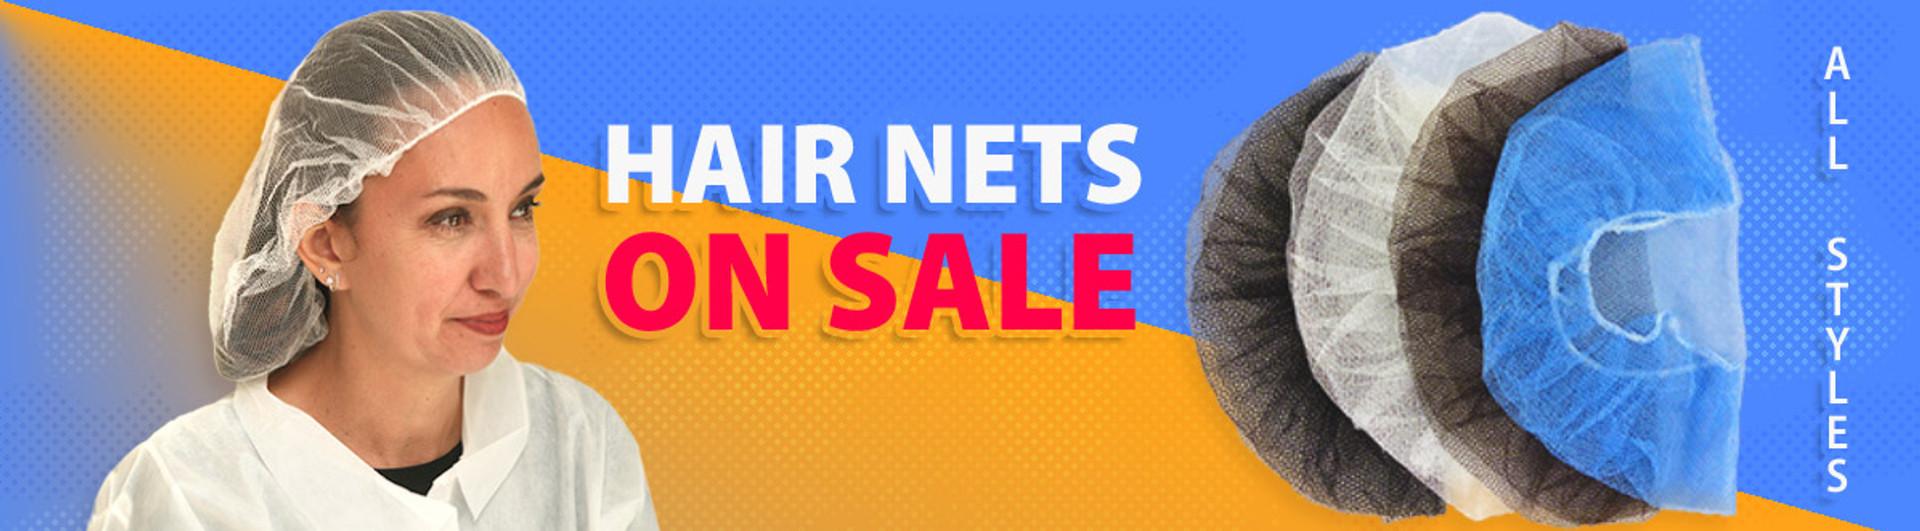 Hair Nets on sale